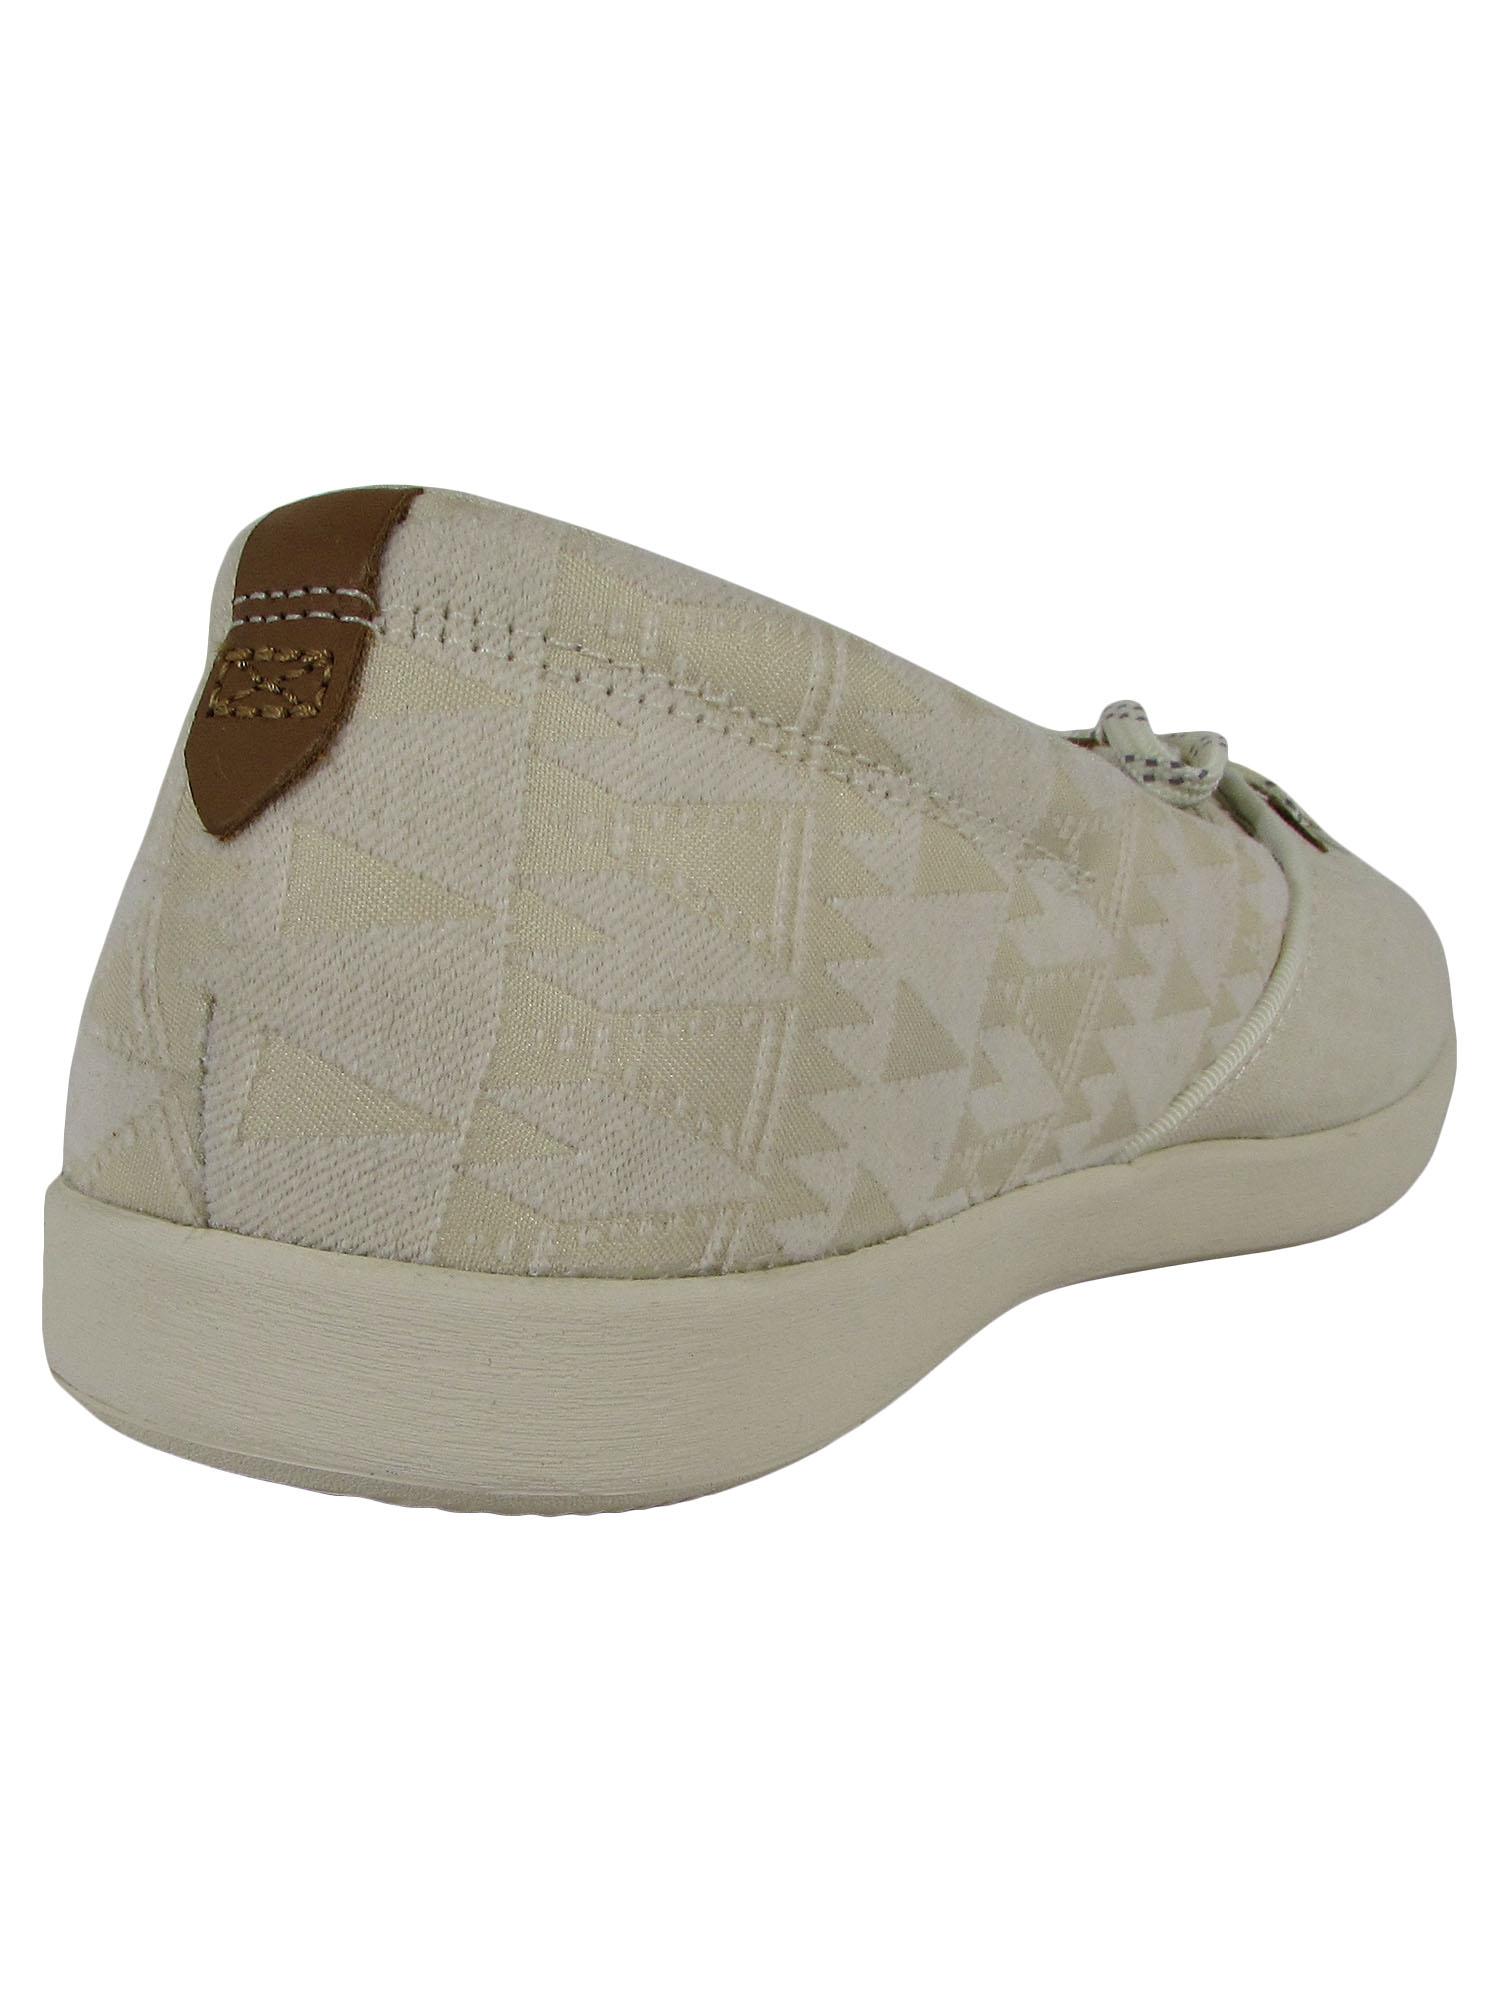 Teva-Womens-Willow-Slip-On-Sneaker-Shoes thumbnail 7